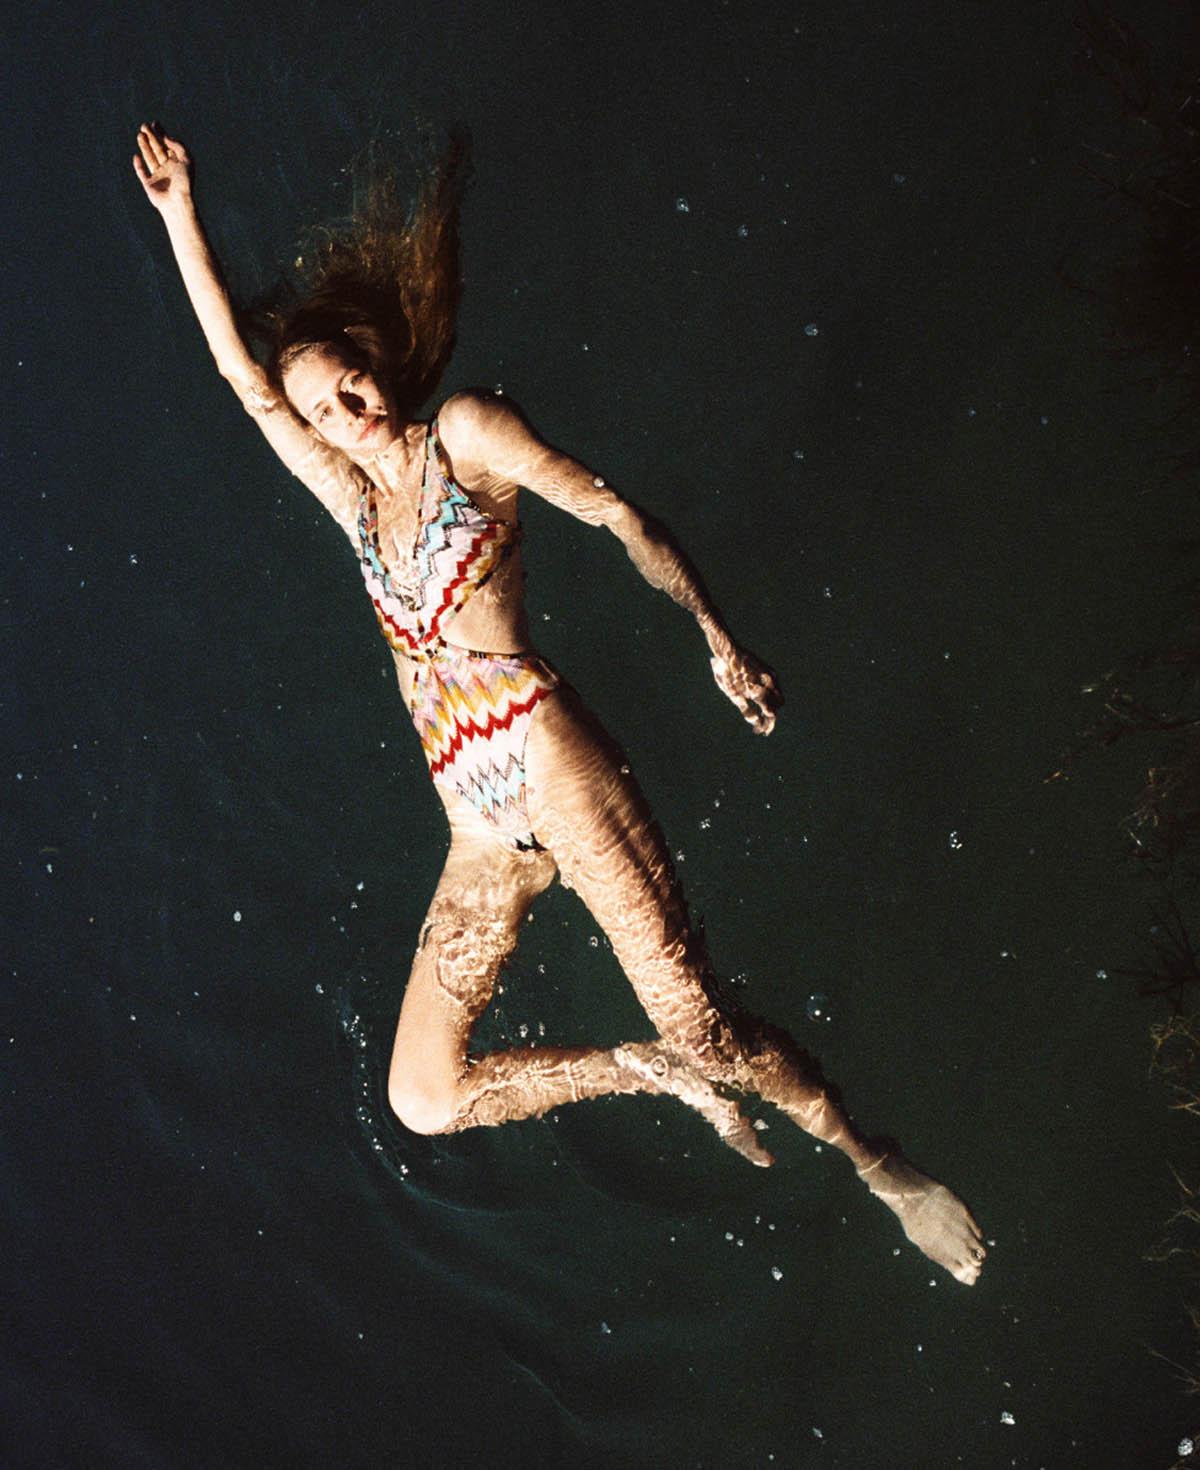 Nikki Mcguire by Bryan Liston for Harper's Bazaar US June July 2021